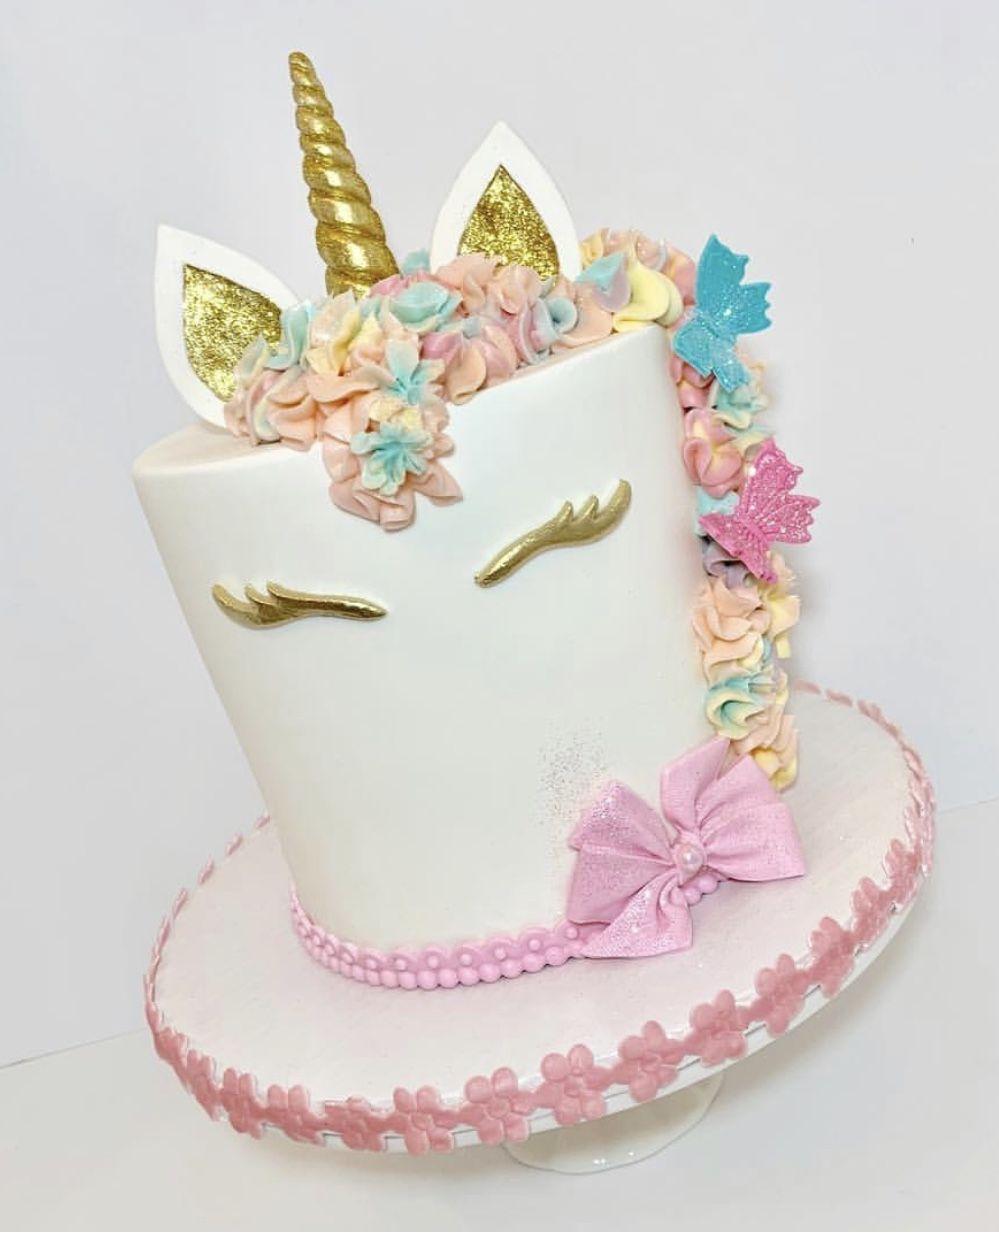 Unicorn Quinceanera Mi Padrino Unicorn Cake Unicorn Desserts Quinceanera Cakes